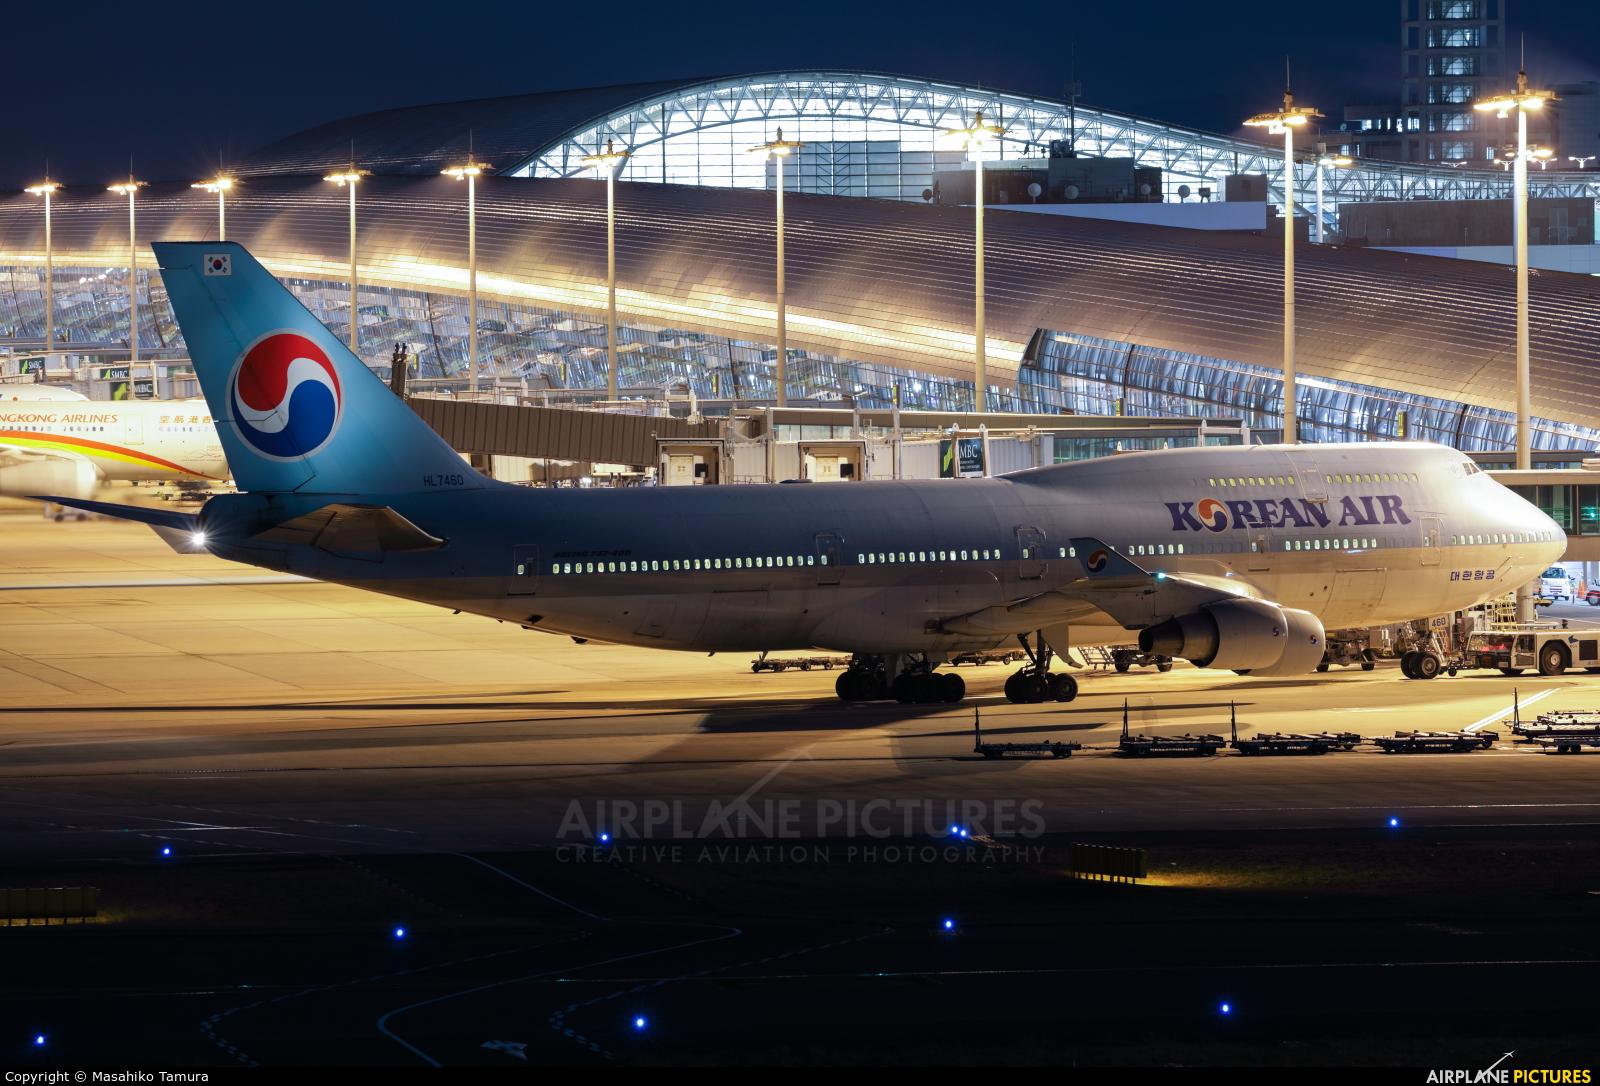 Korean Air HL7460 aircraft at Kansai Intl